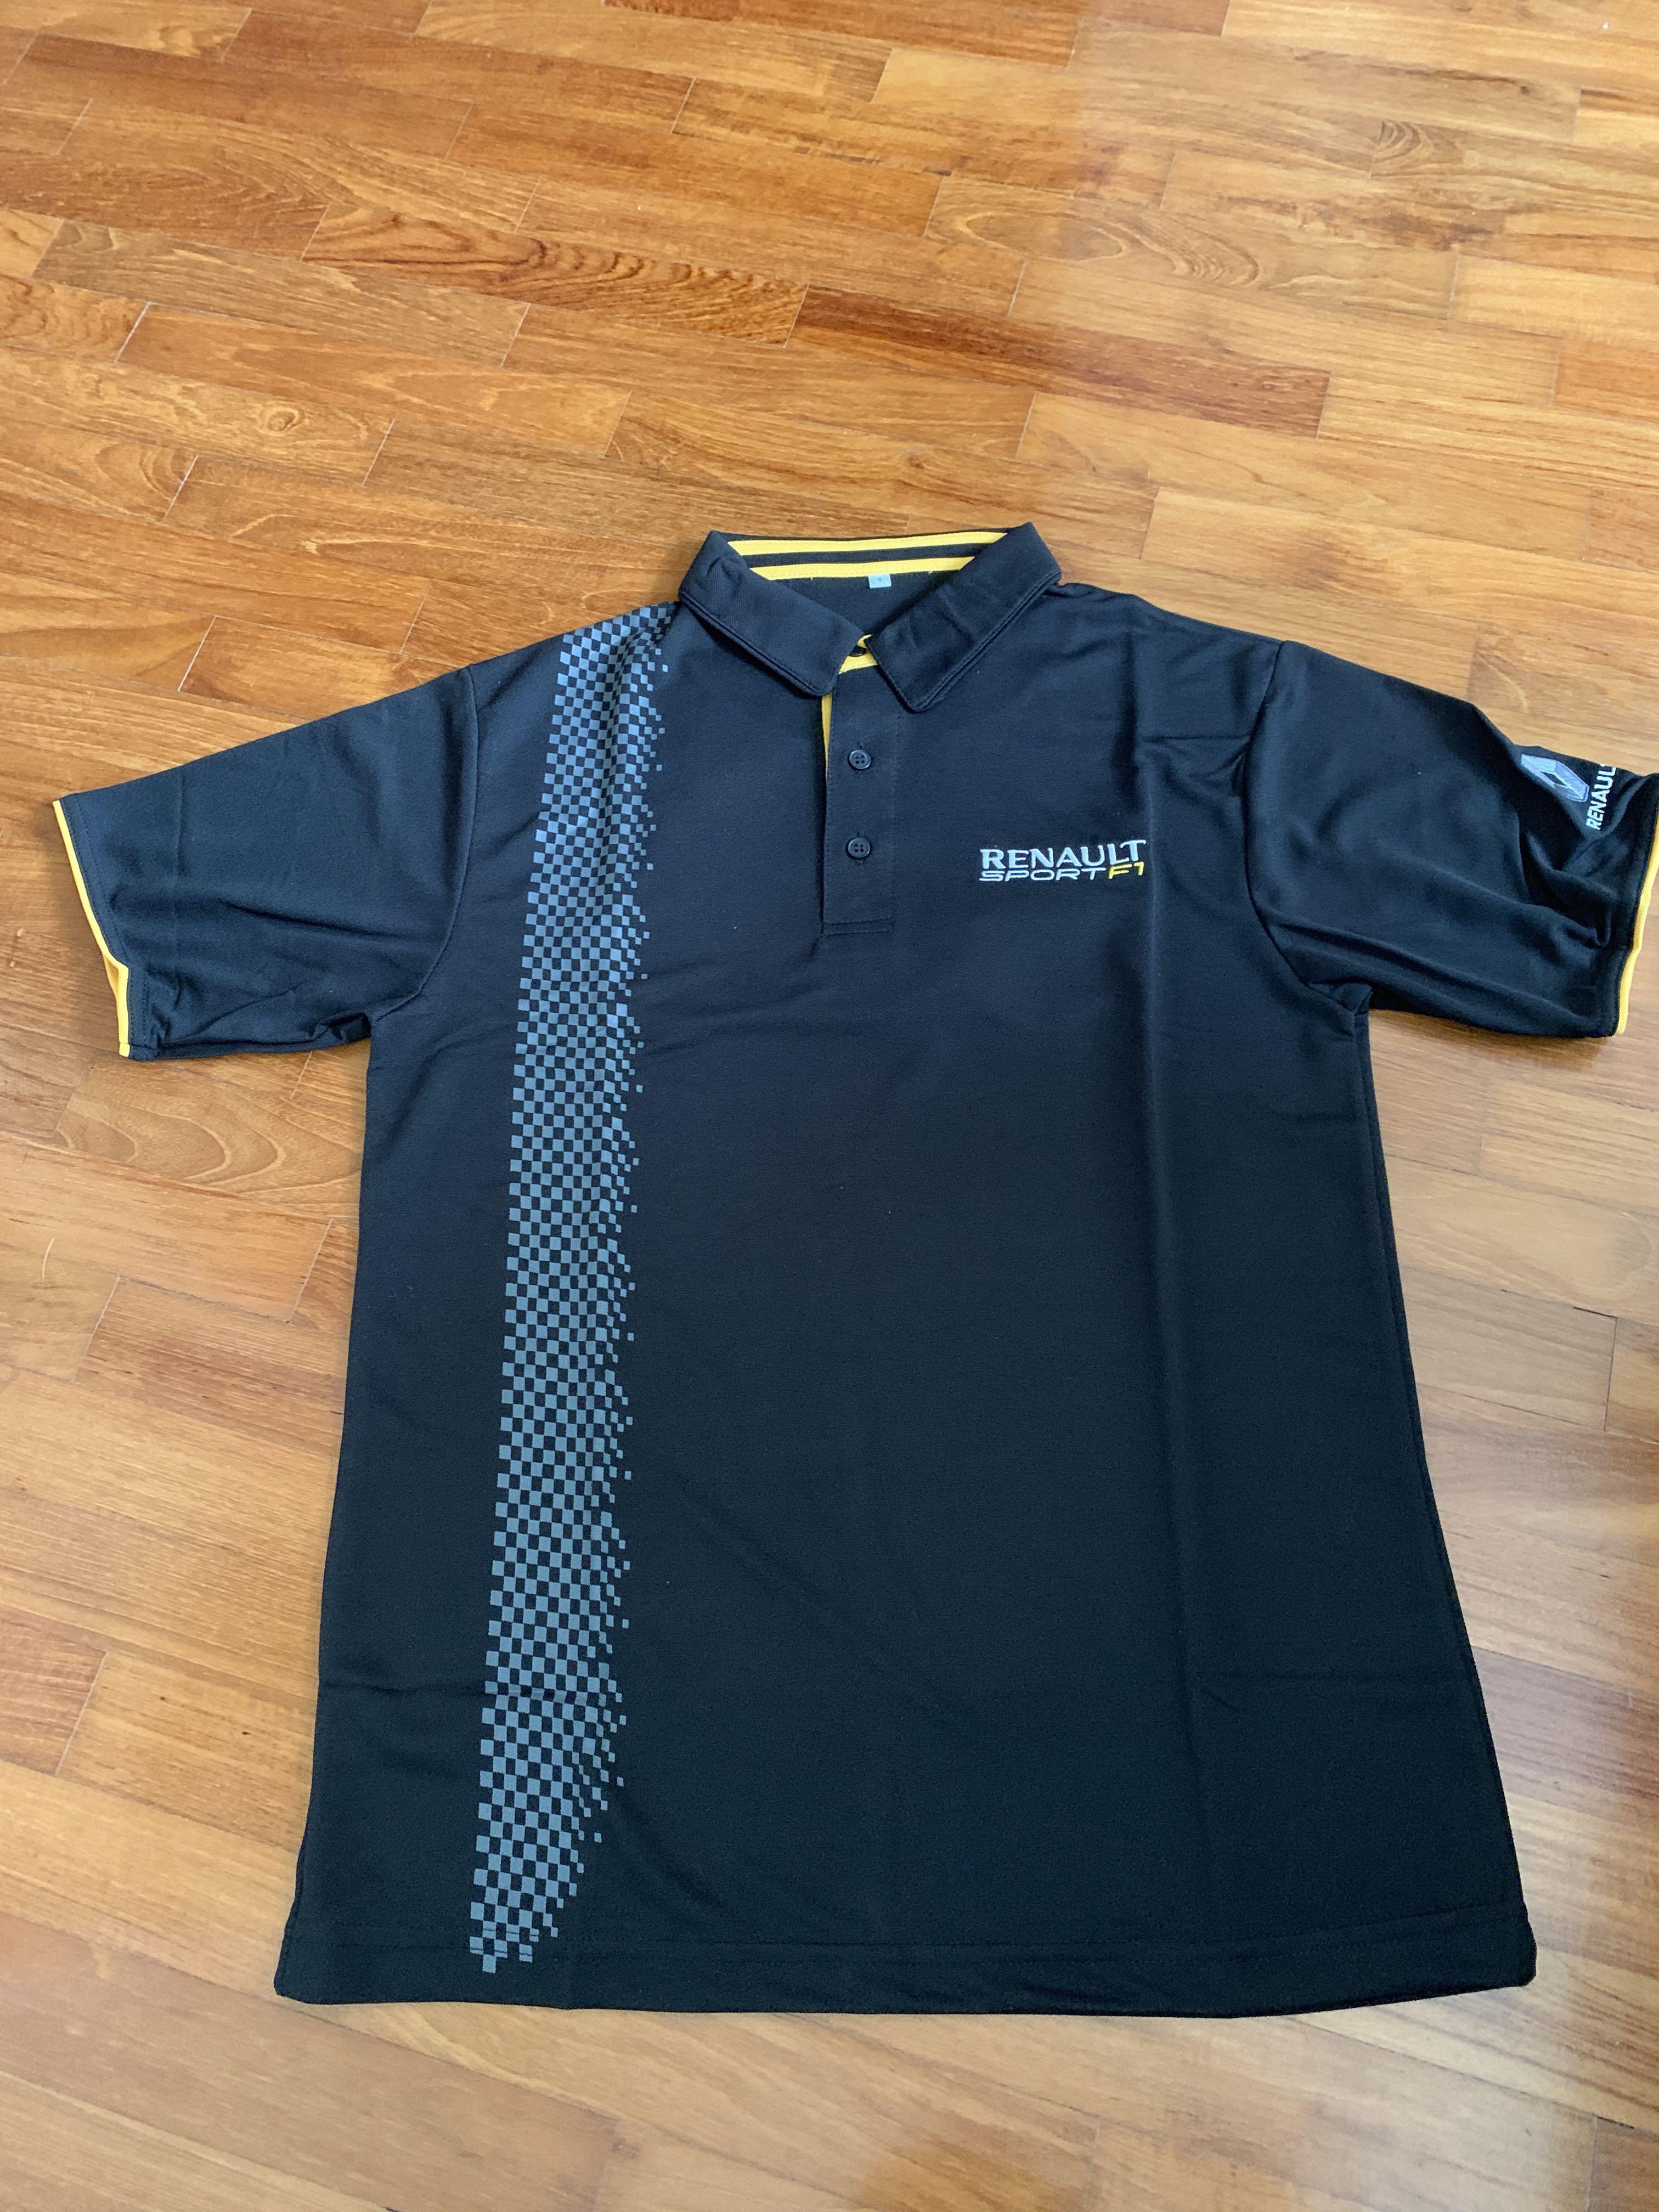 Renault Sport F1 Polo shirt (BN) #MRTRaffles #MRTTampines